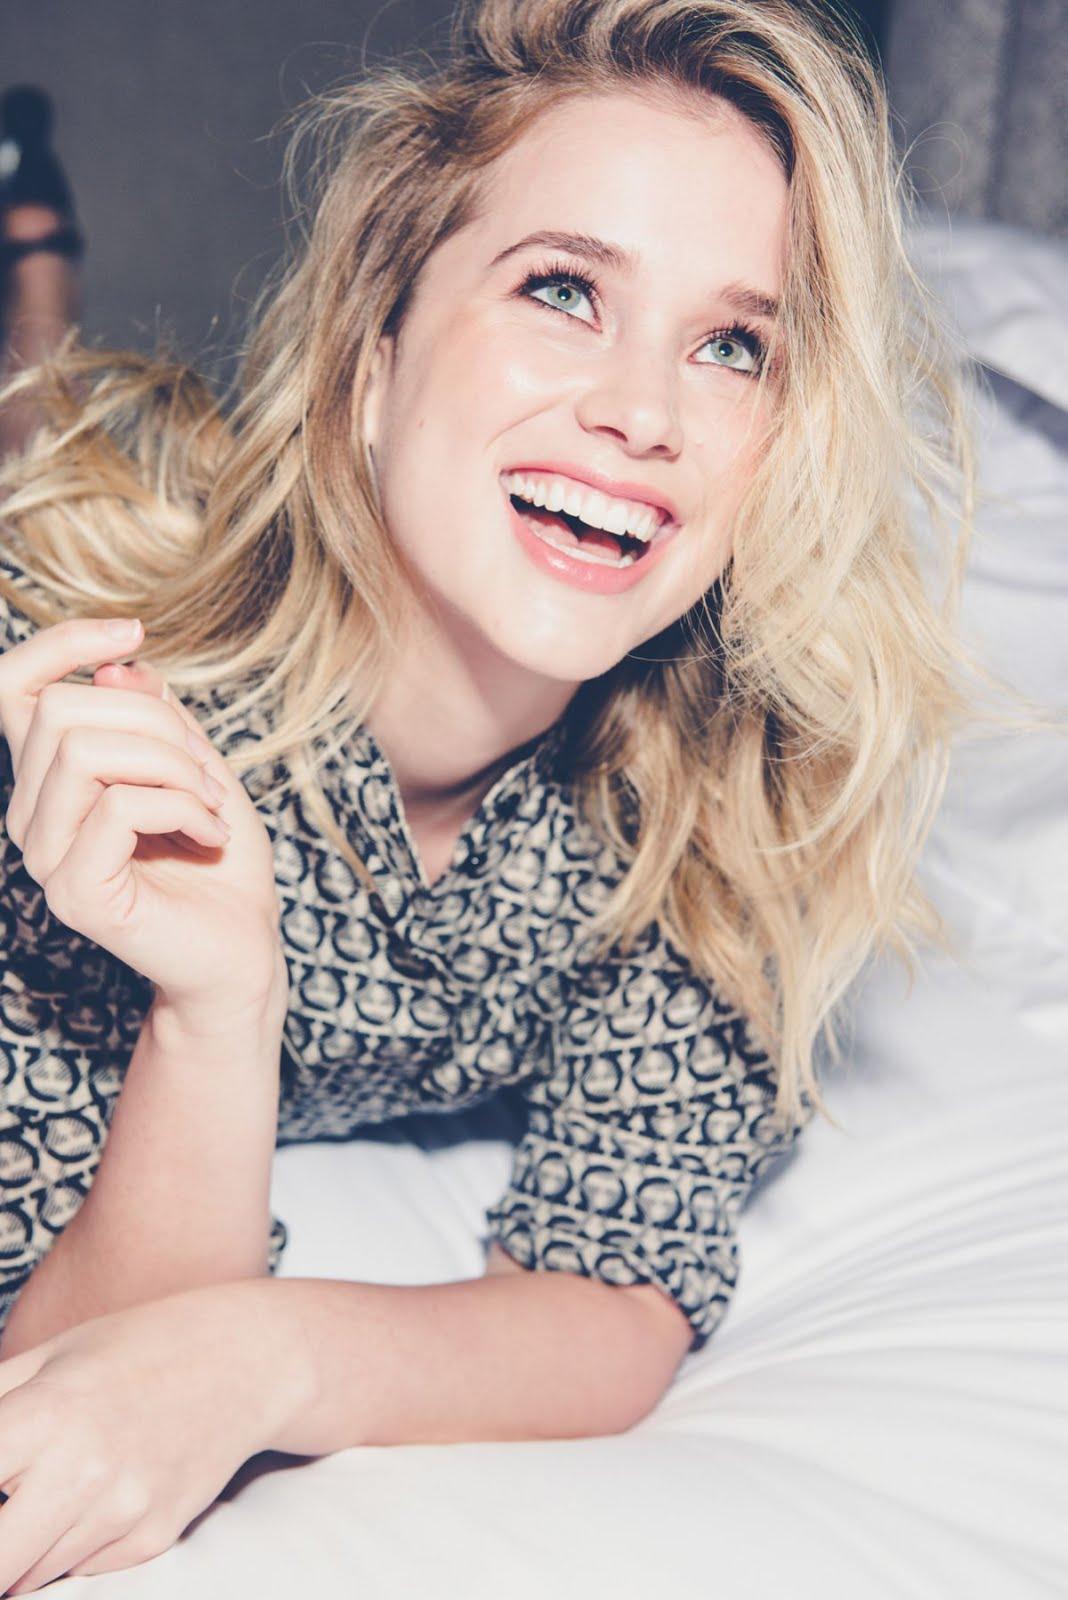 Elizabeth Lail Photoshoot For Coveteur Ferragamo February 2019 By